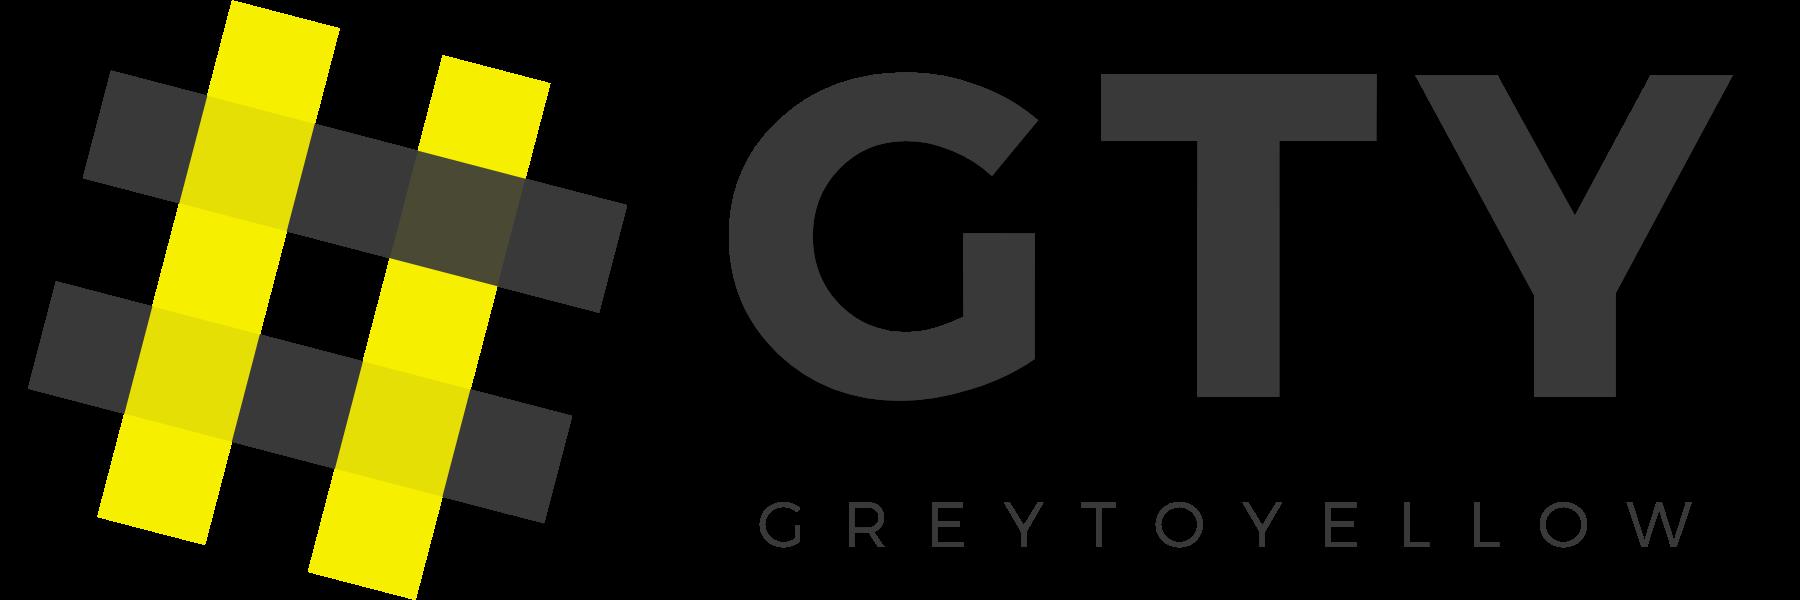 GREYTOYELLOW 3